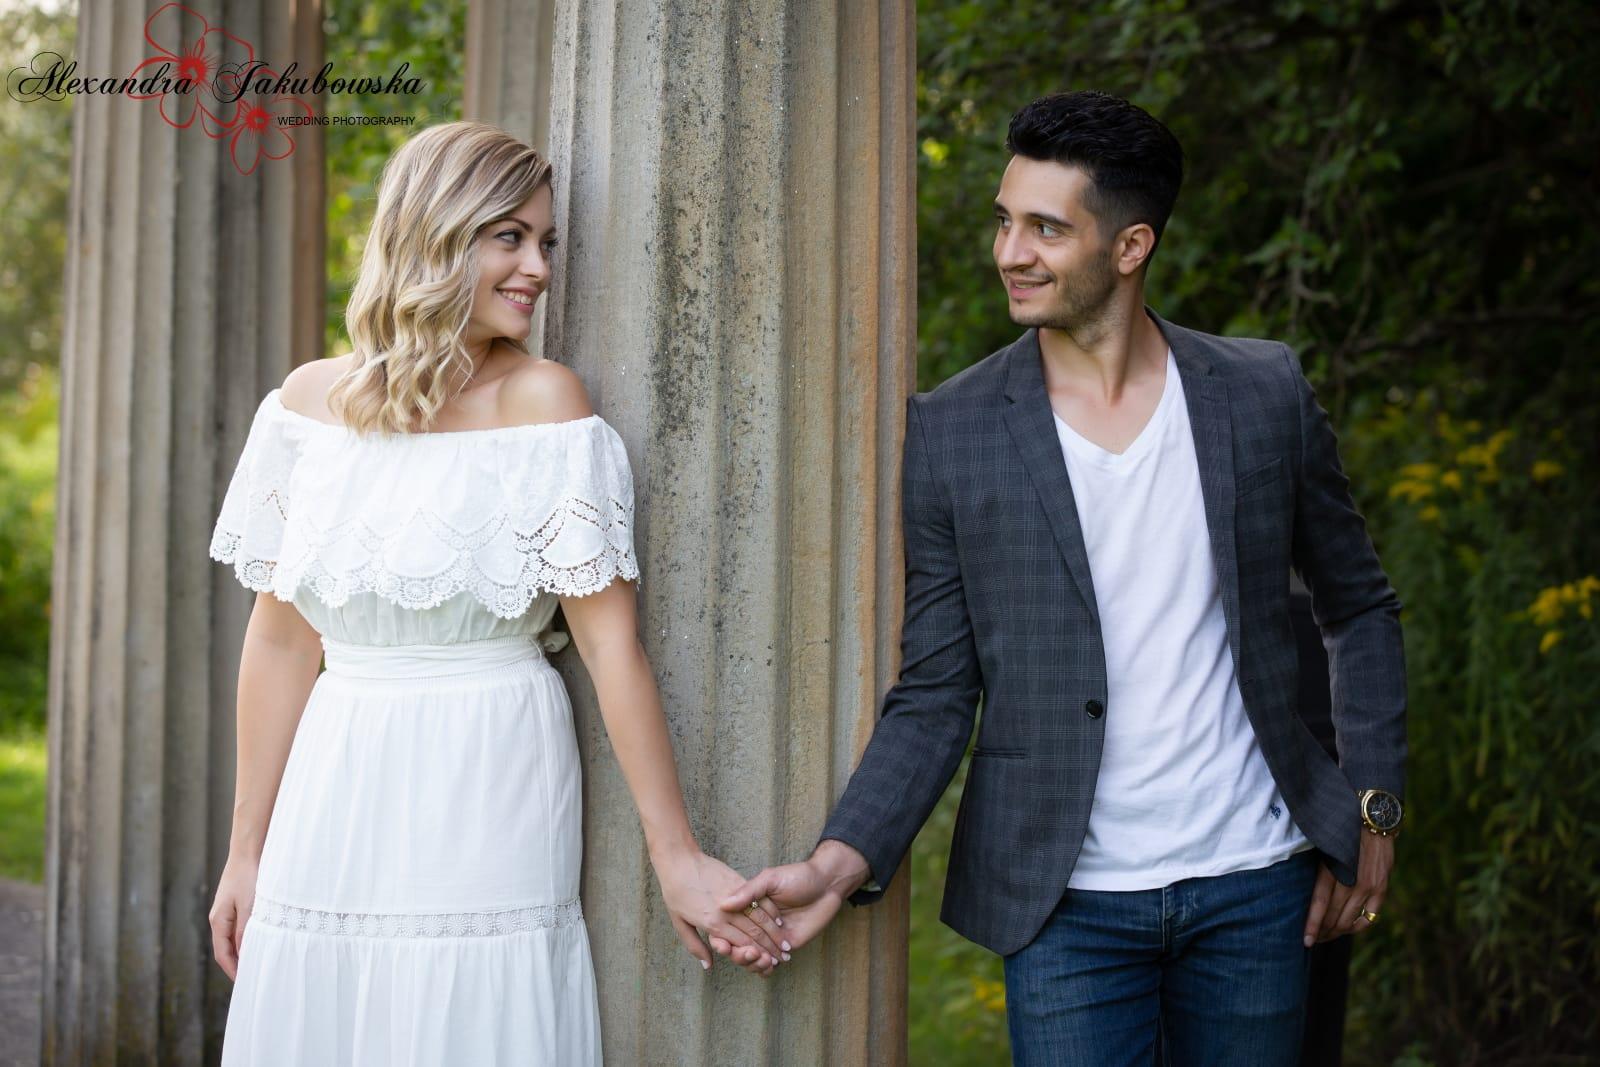 Oakville Wedding Photography - Engagement Session Guideline